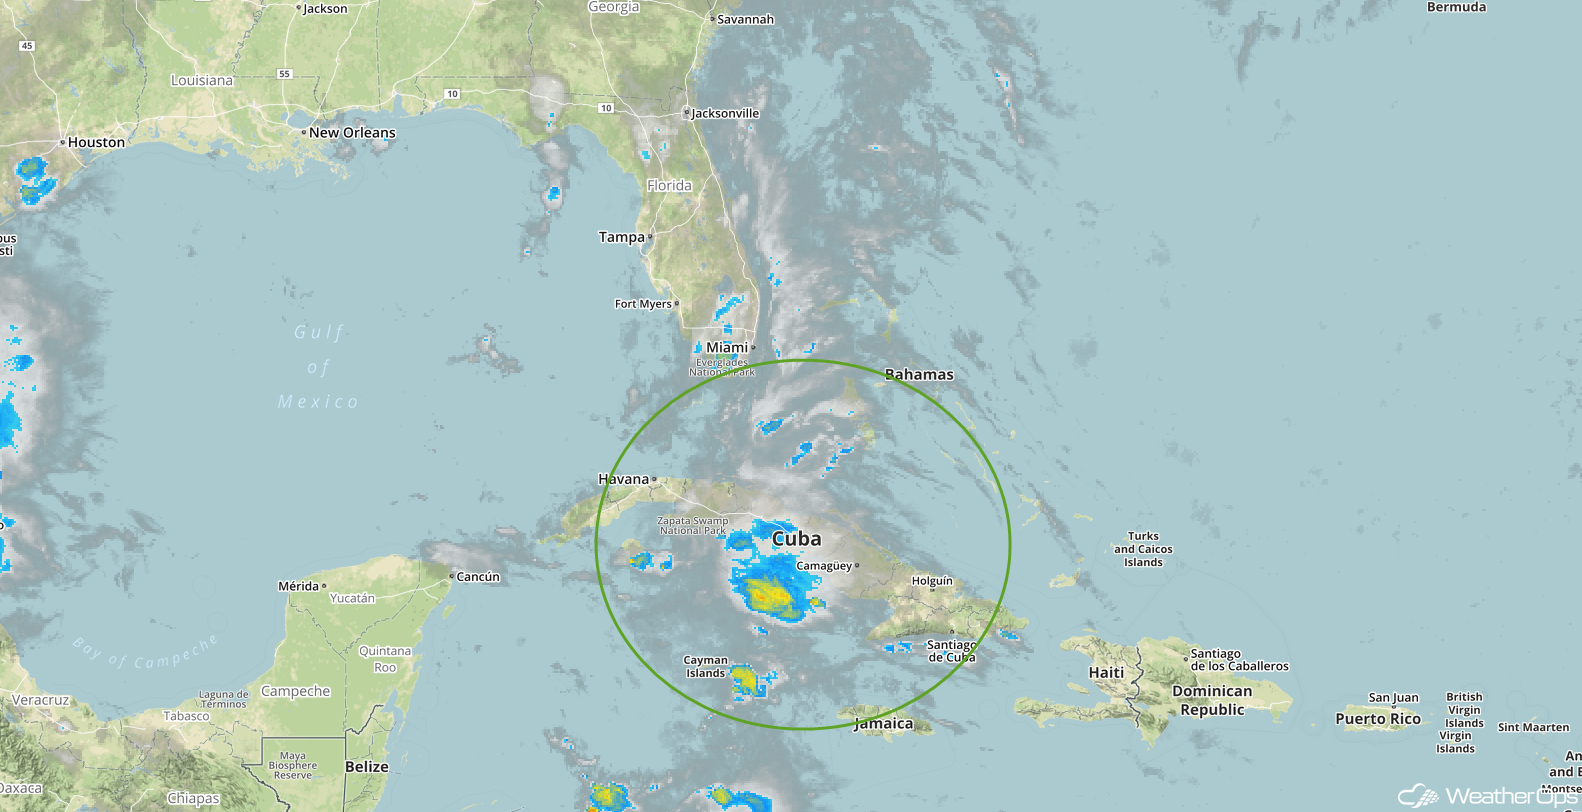 Enhanced Infrared Tropical Satellite 5/21/18